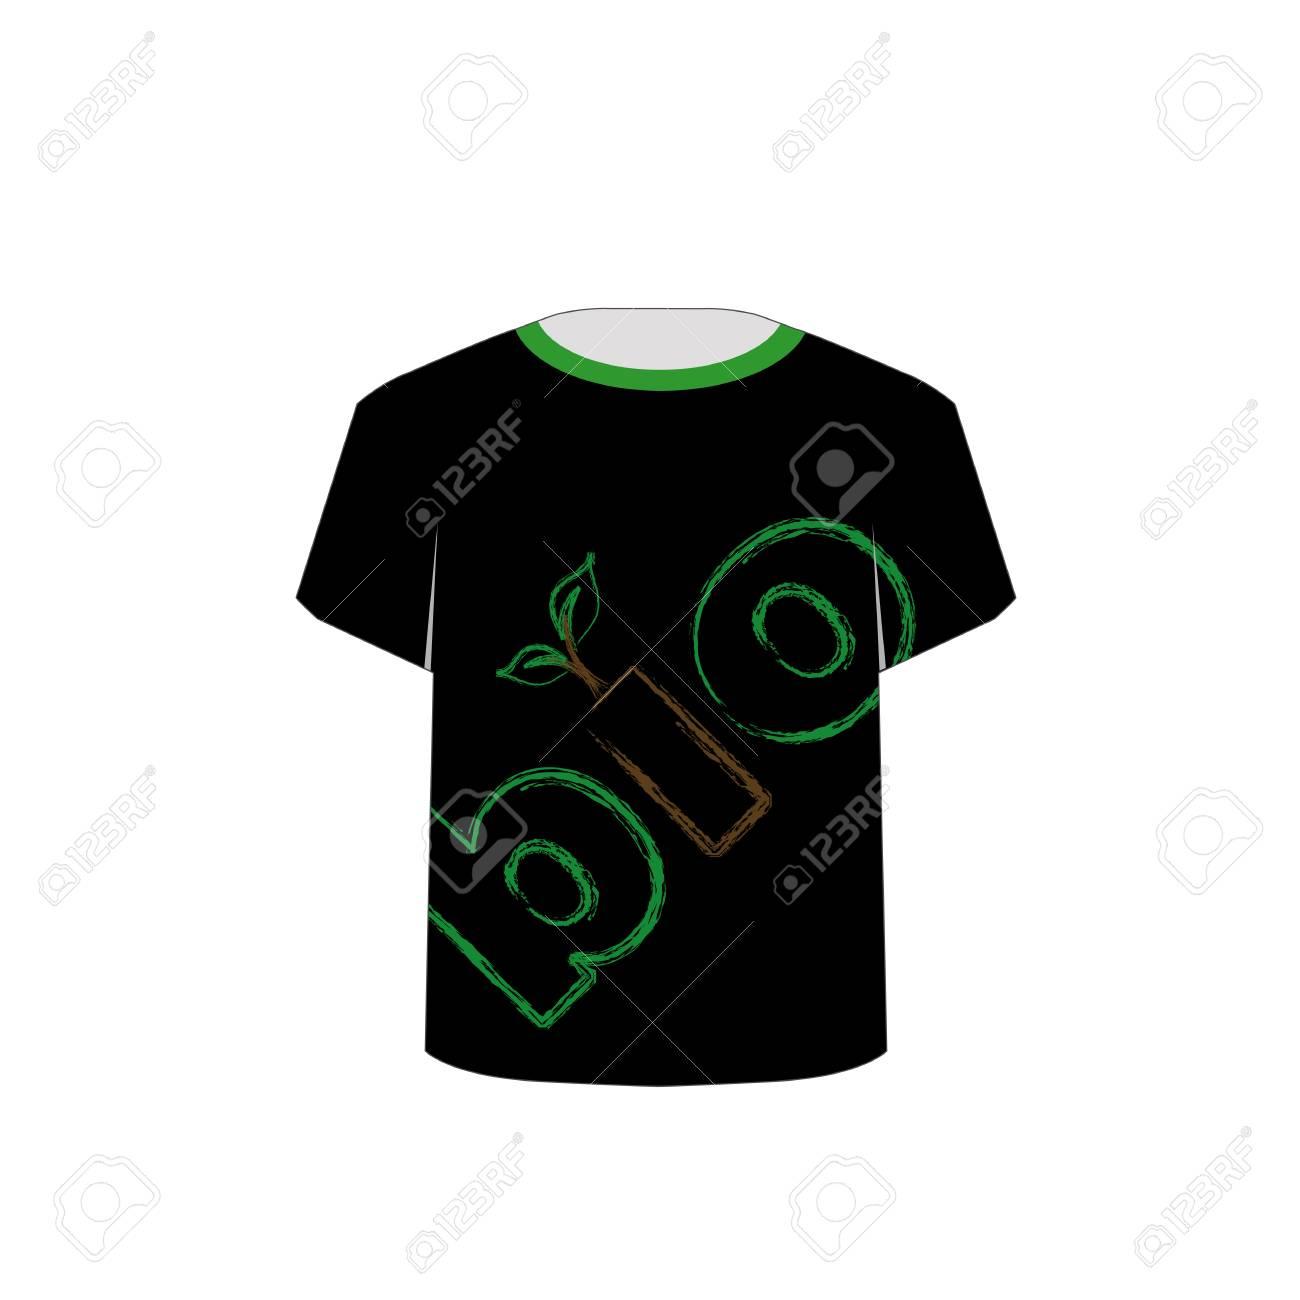 T Shirt Template- eco friendly design Stock Vector - 22719434